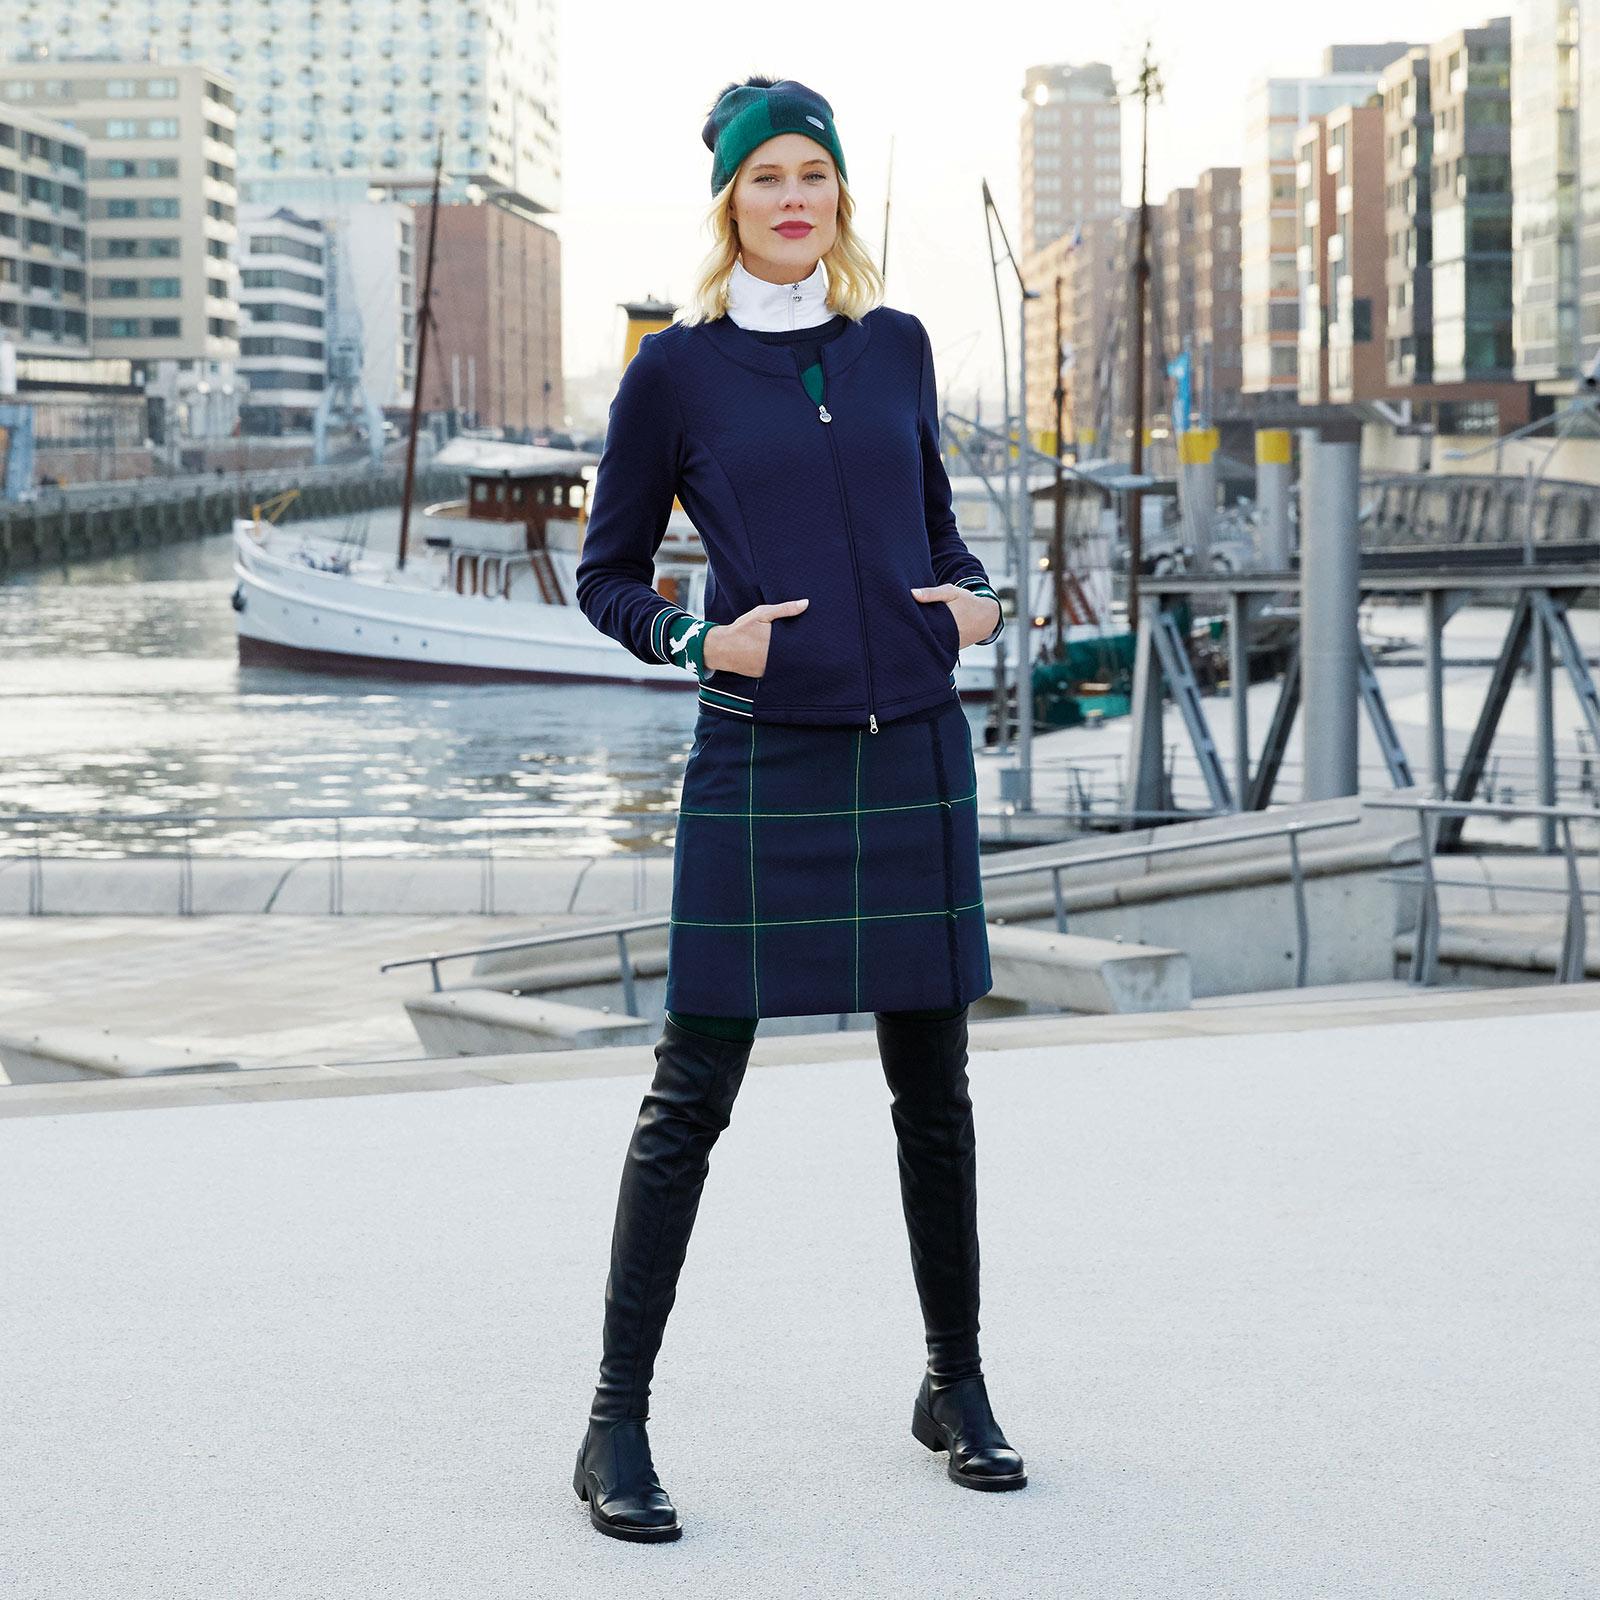 Langer Damen Karo-Golfskort aus softem Stretchmaterial mit Shorts